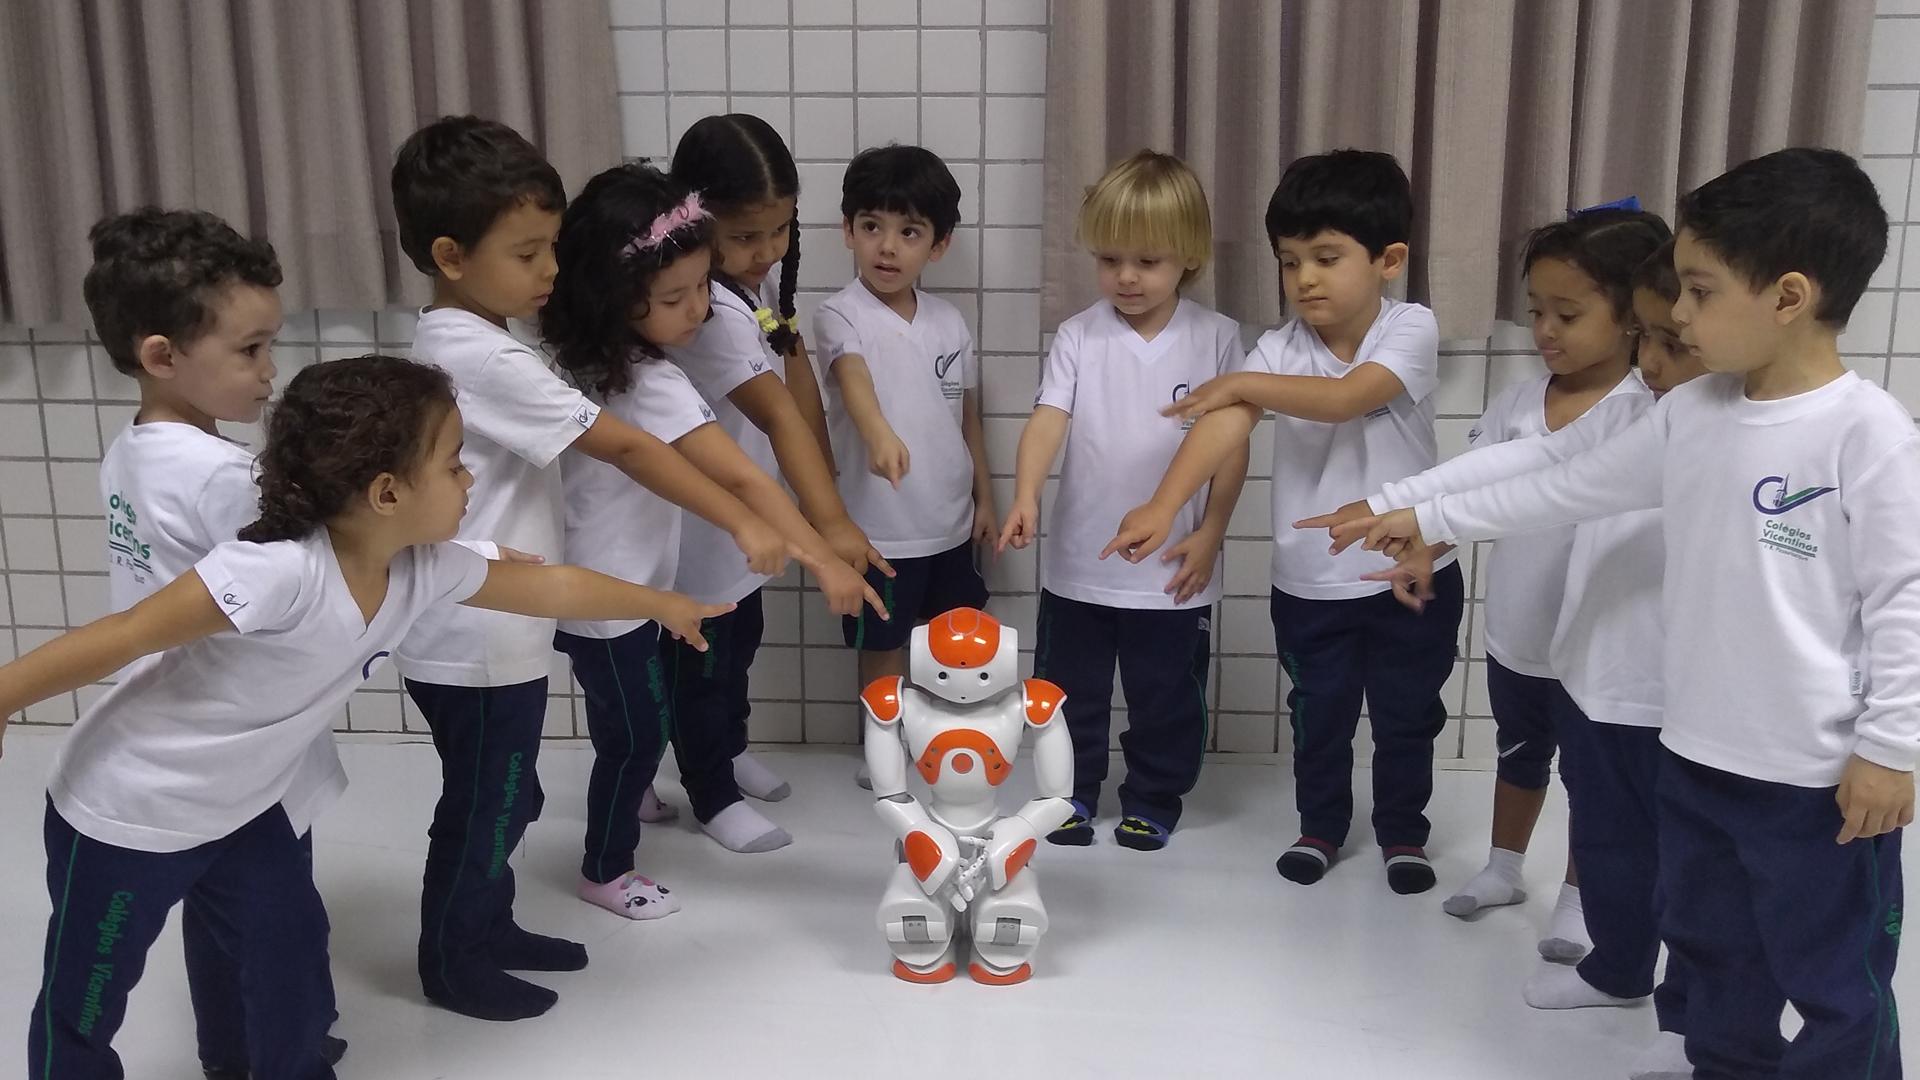 [Aula interativa com o Robô Nao - Maternal II A]